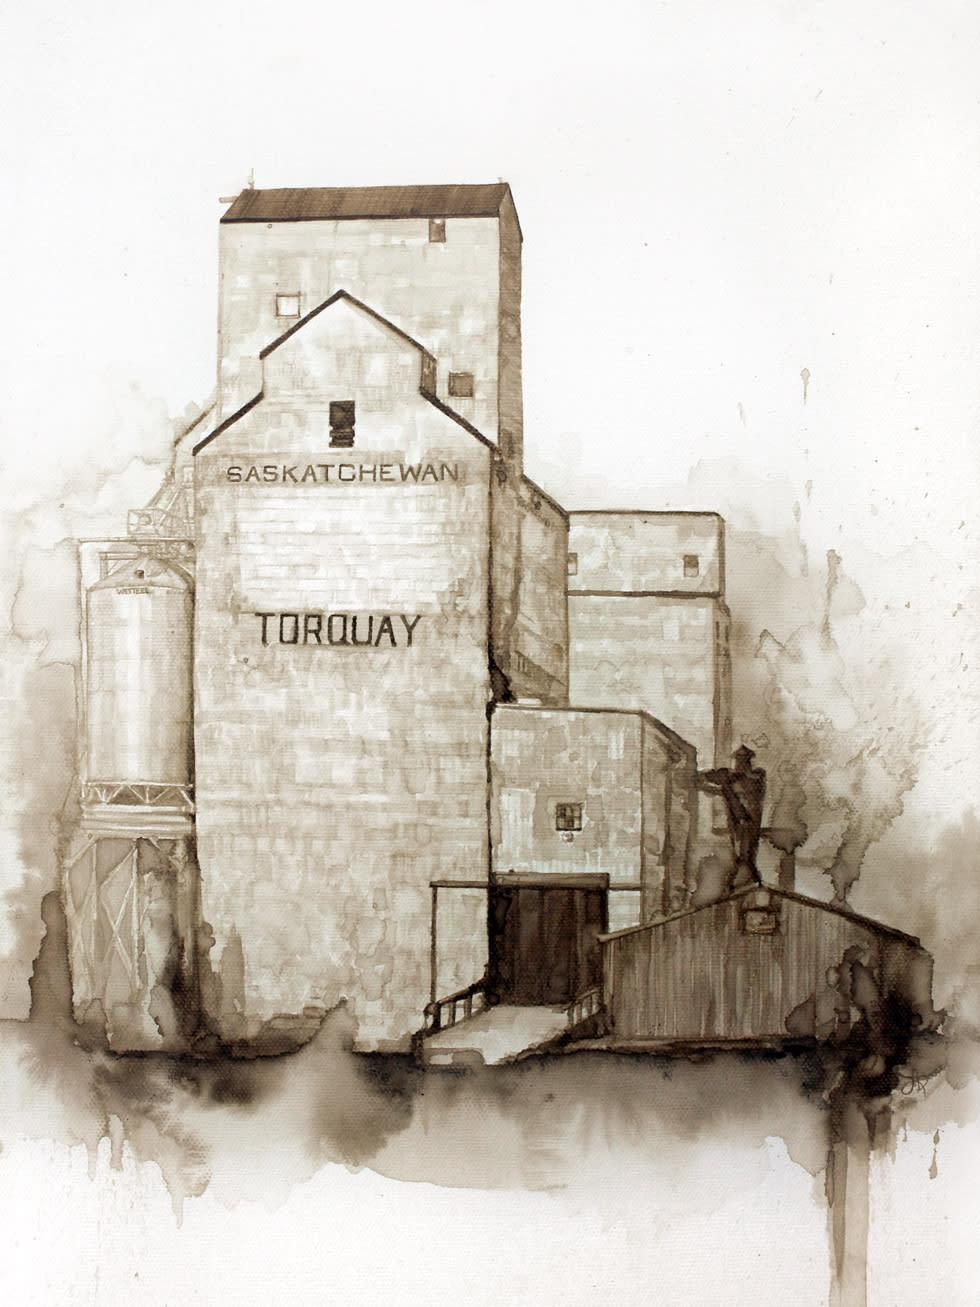 Torquay elevator preview gidp8z